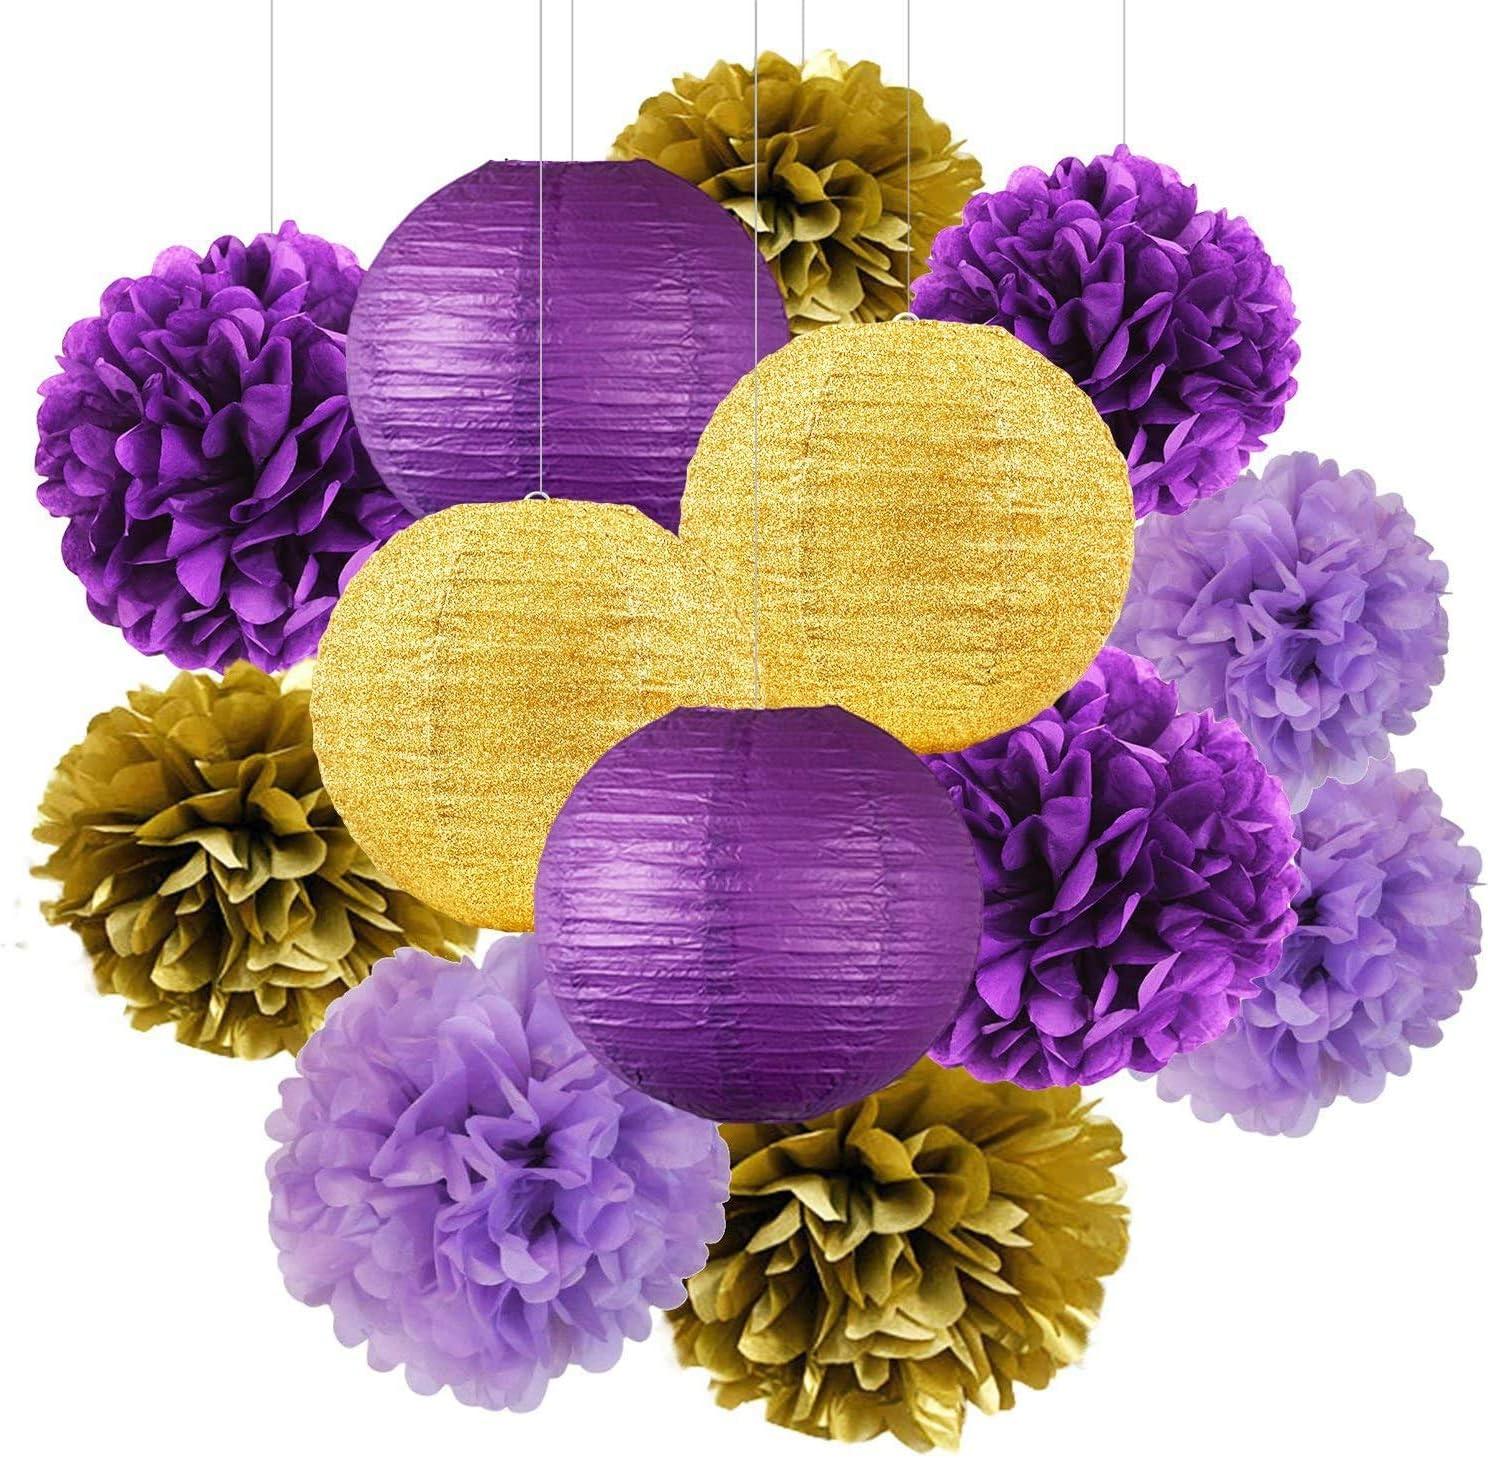 Graduation Decorations Purple Gold 2021 Furuix Purple Gold Birthday Party Decorations Glitter Gold/Purple Paper Lanterns Purple Birthday/Baby Shower/Bridal Shower/Wedding Decorations/LSU Decorations